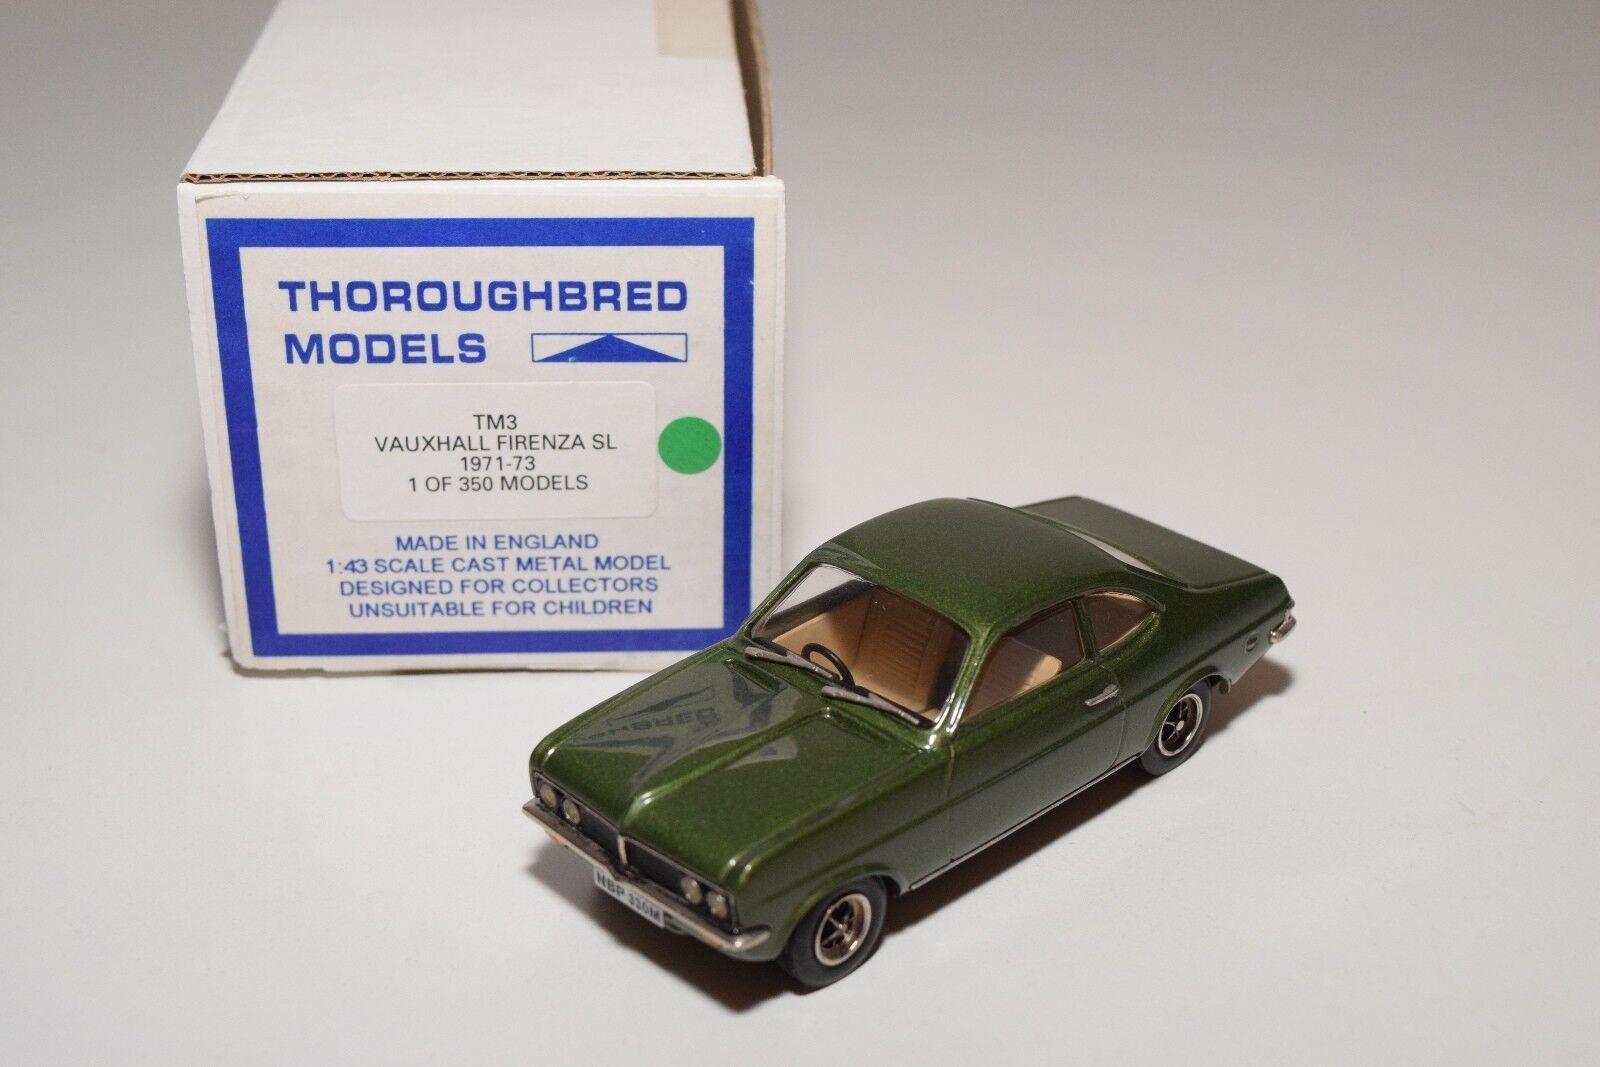 THGoldUGHBrot MODELS TM3 VAUXHALL FIRENZA SL 1971-73 MINT BOXED RARE   1 350